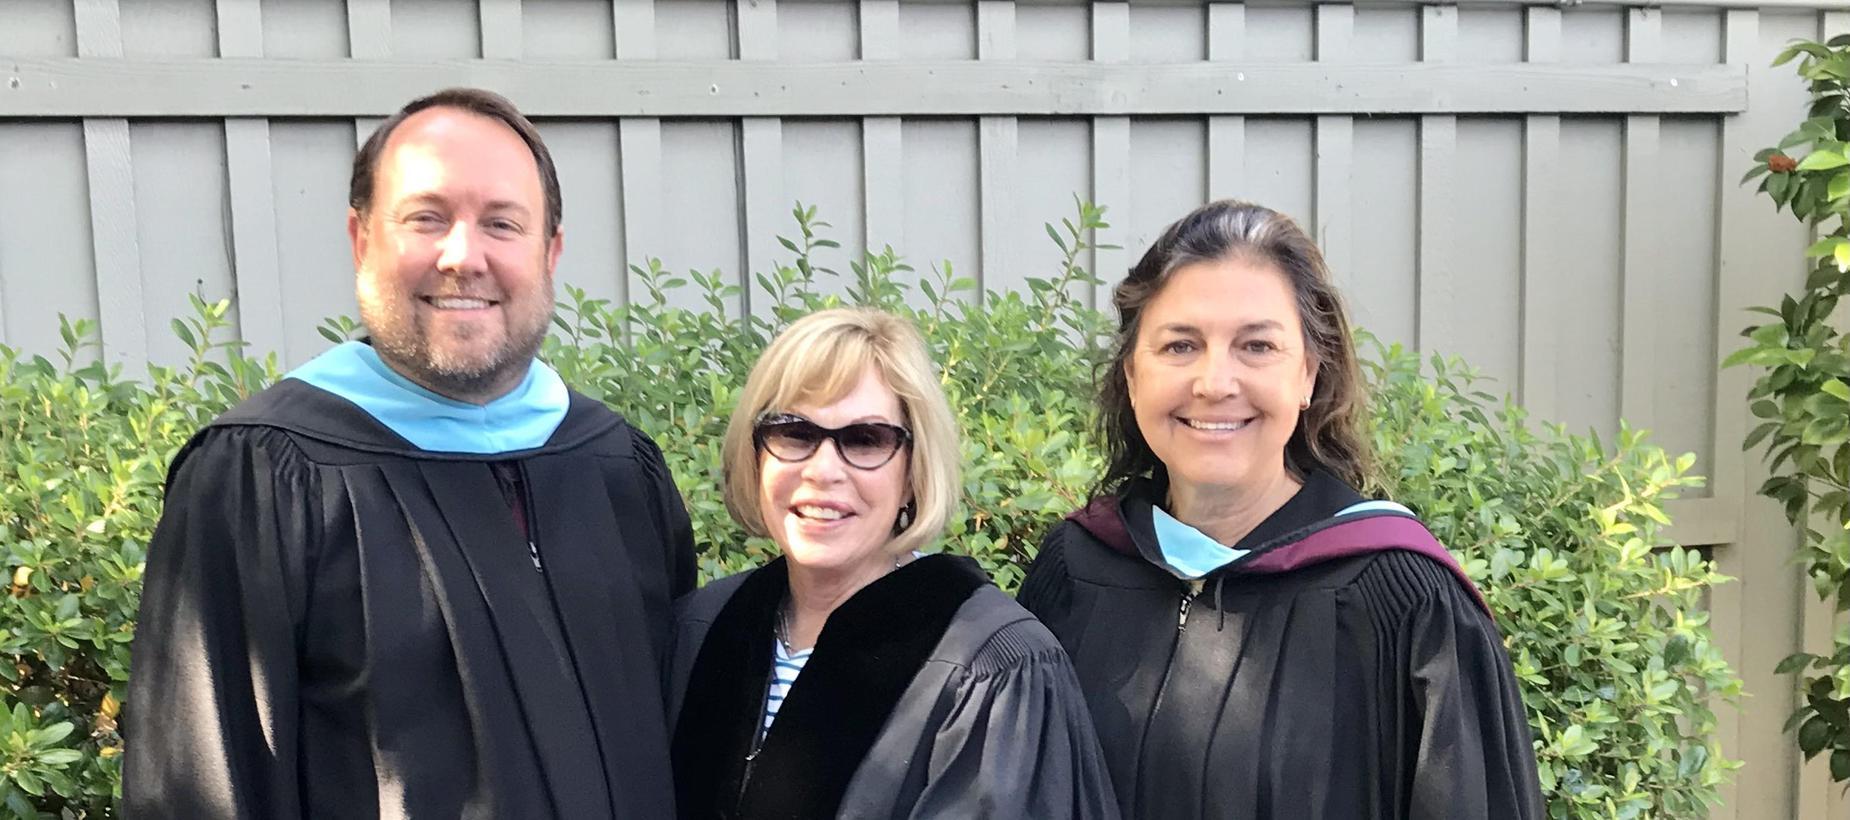 Mr. Schiermeyer, Dr. Bruton, Ms. Lahey at Graduation